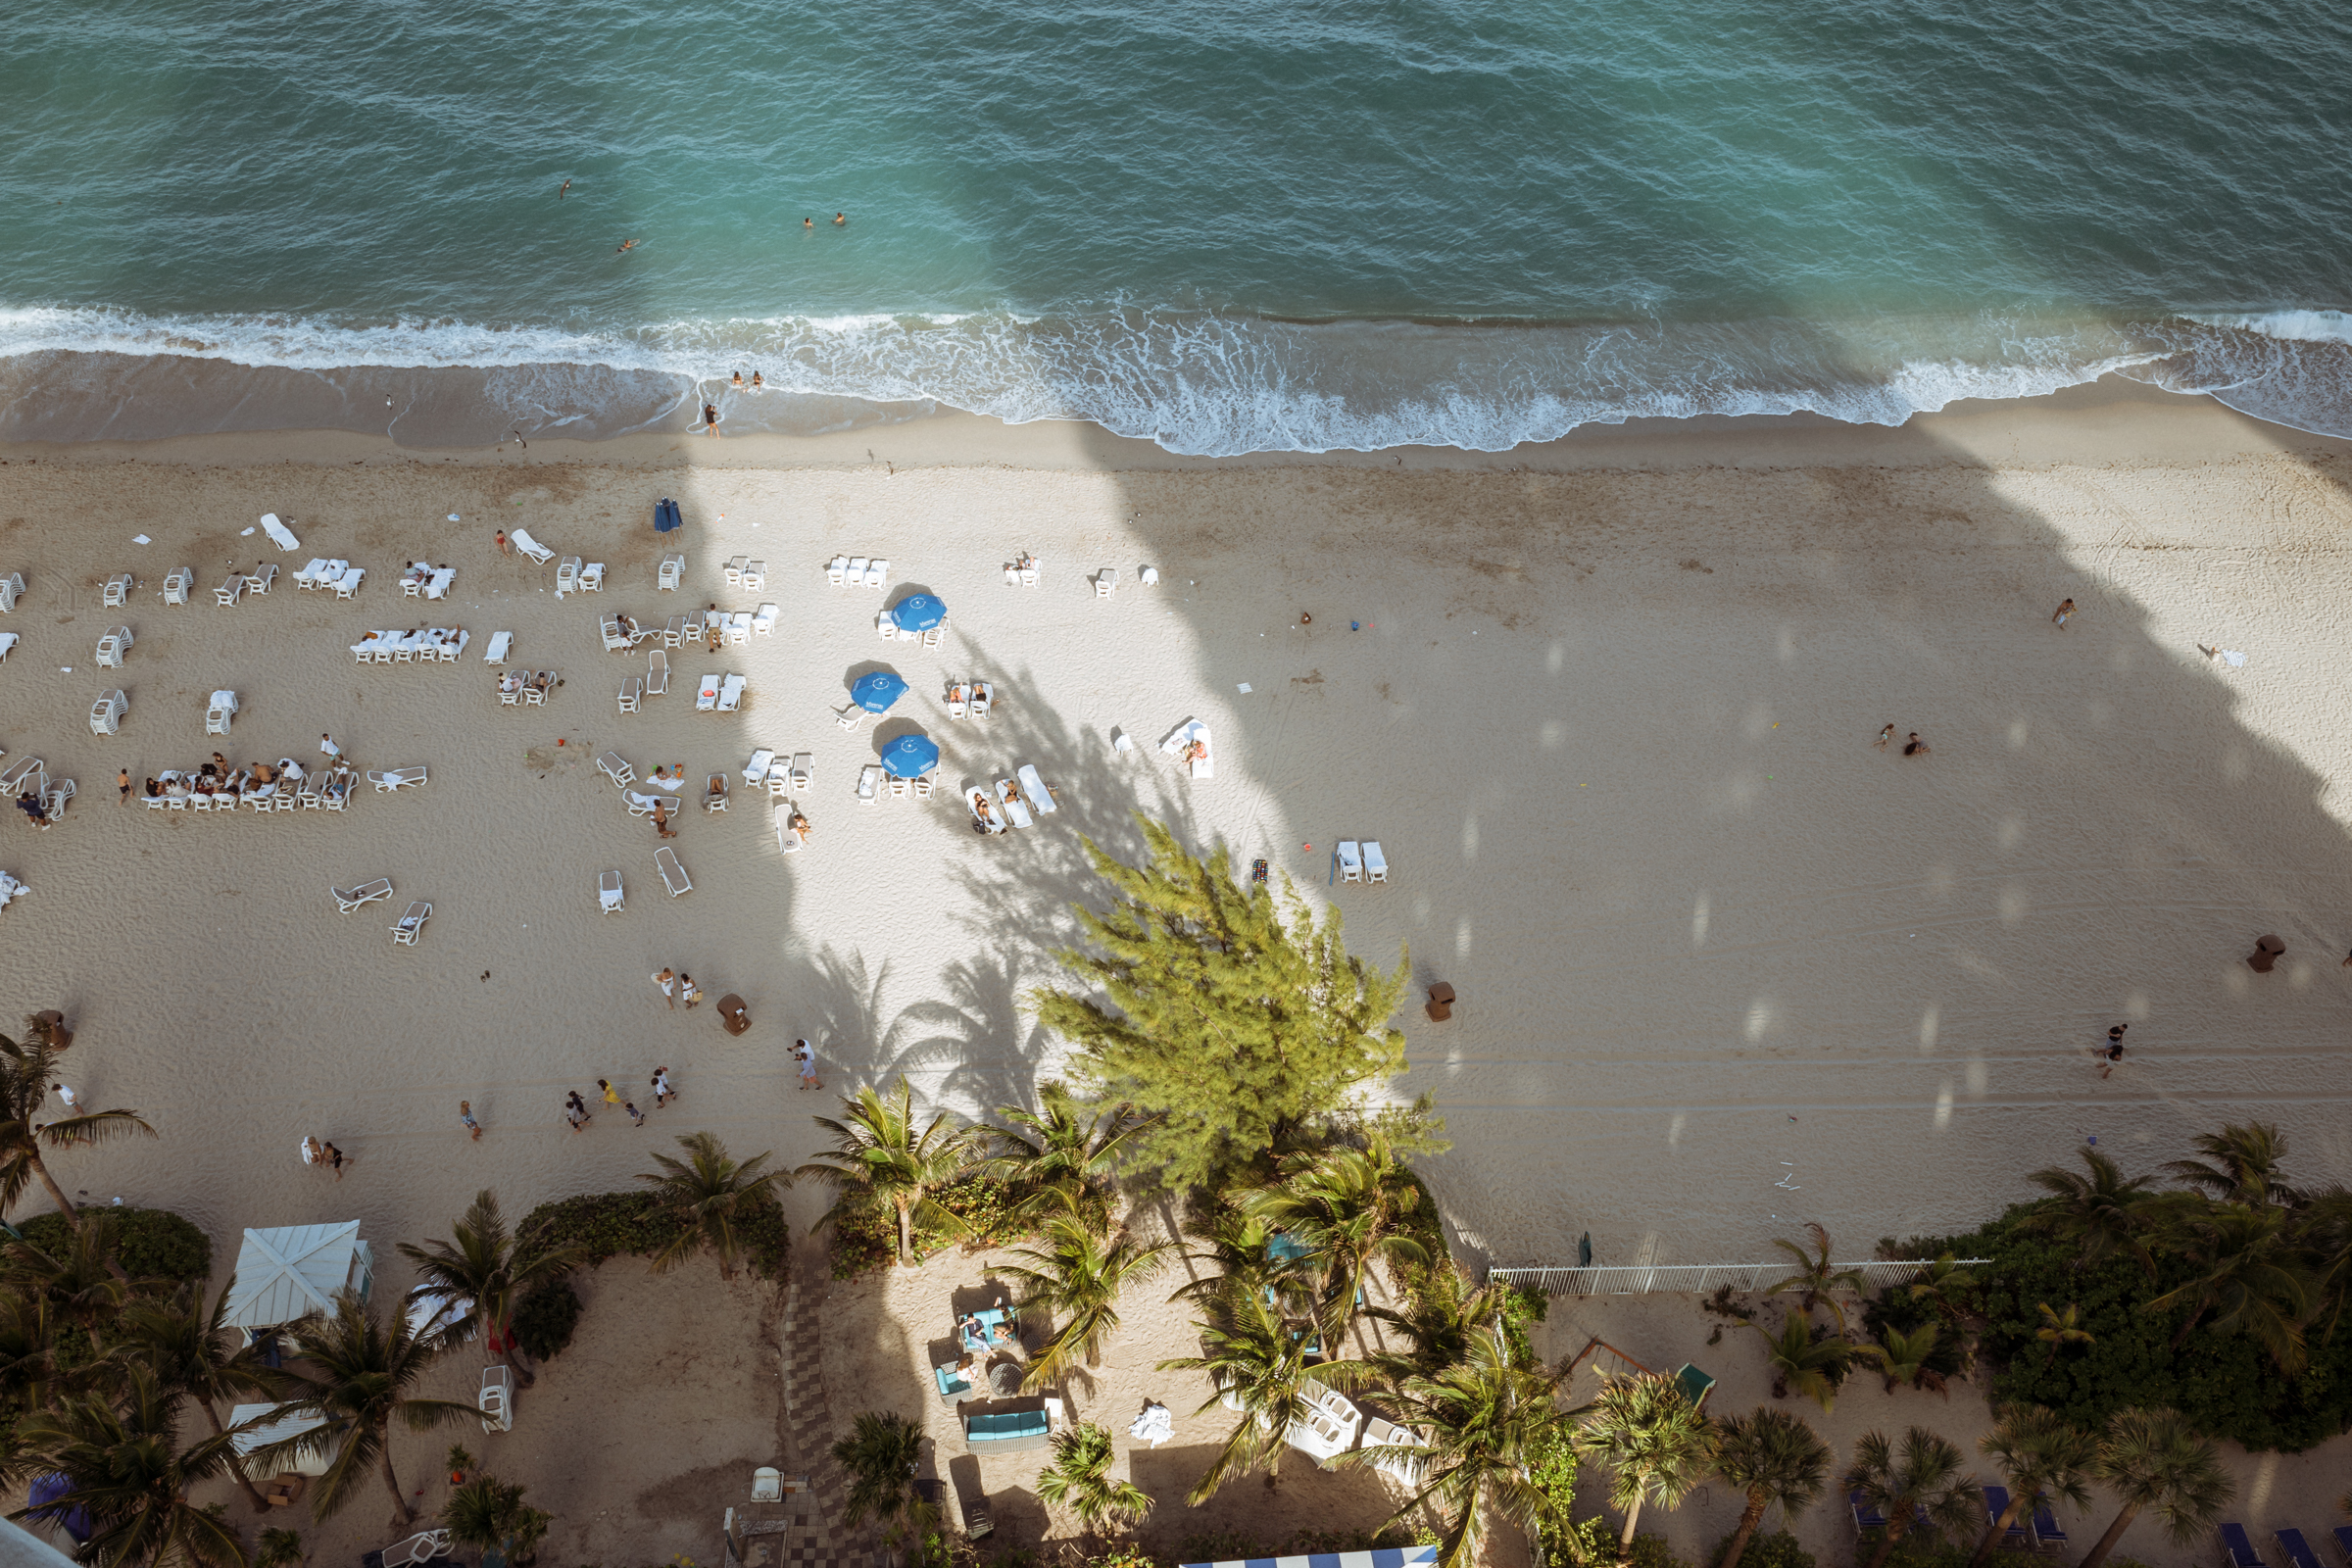 sunny isles beach in Miami Florida